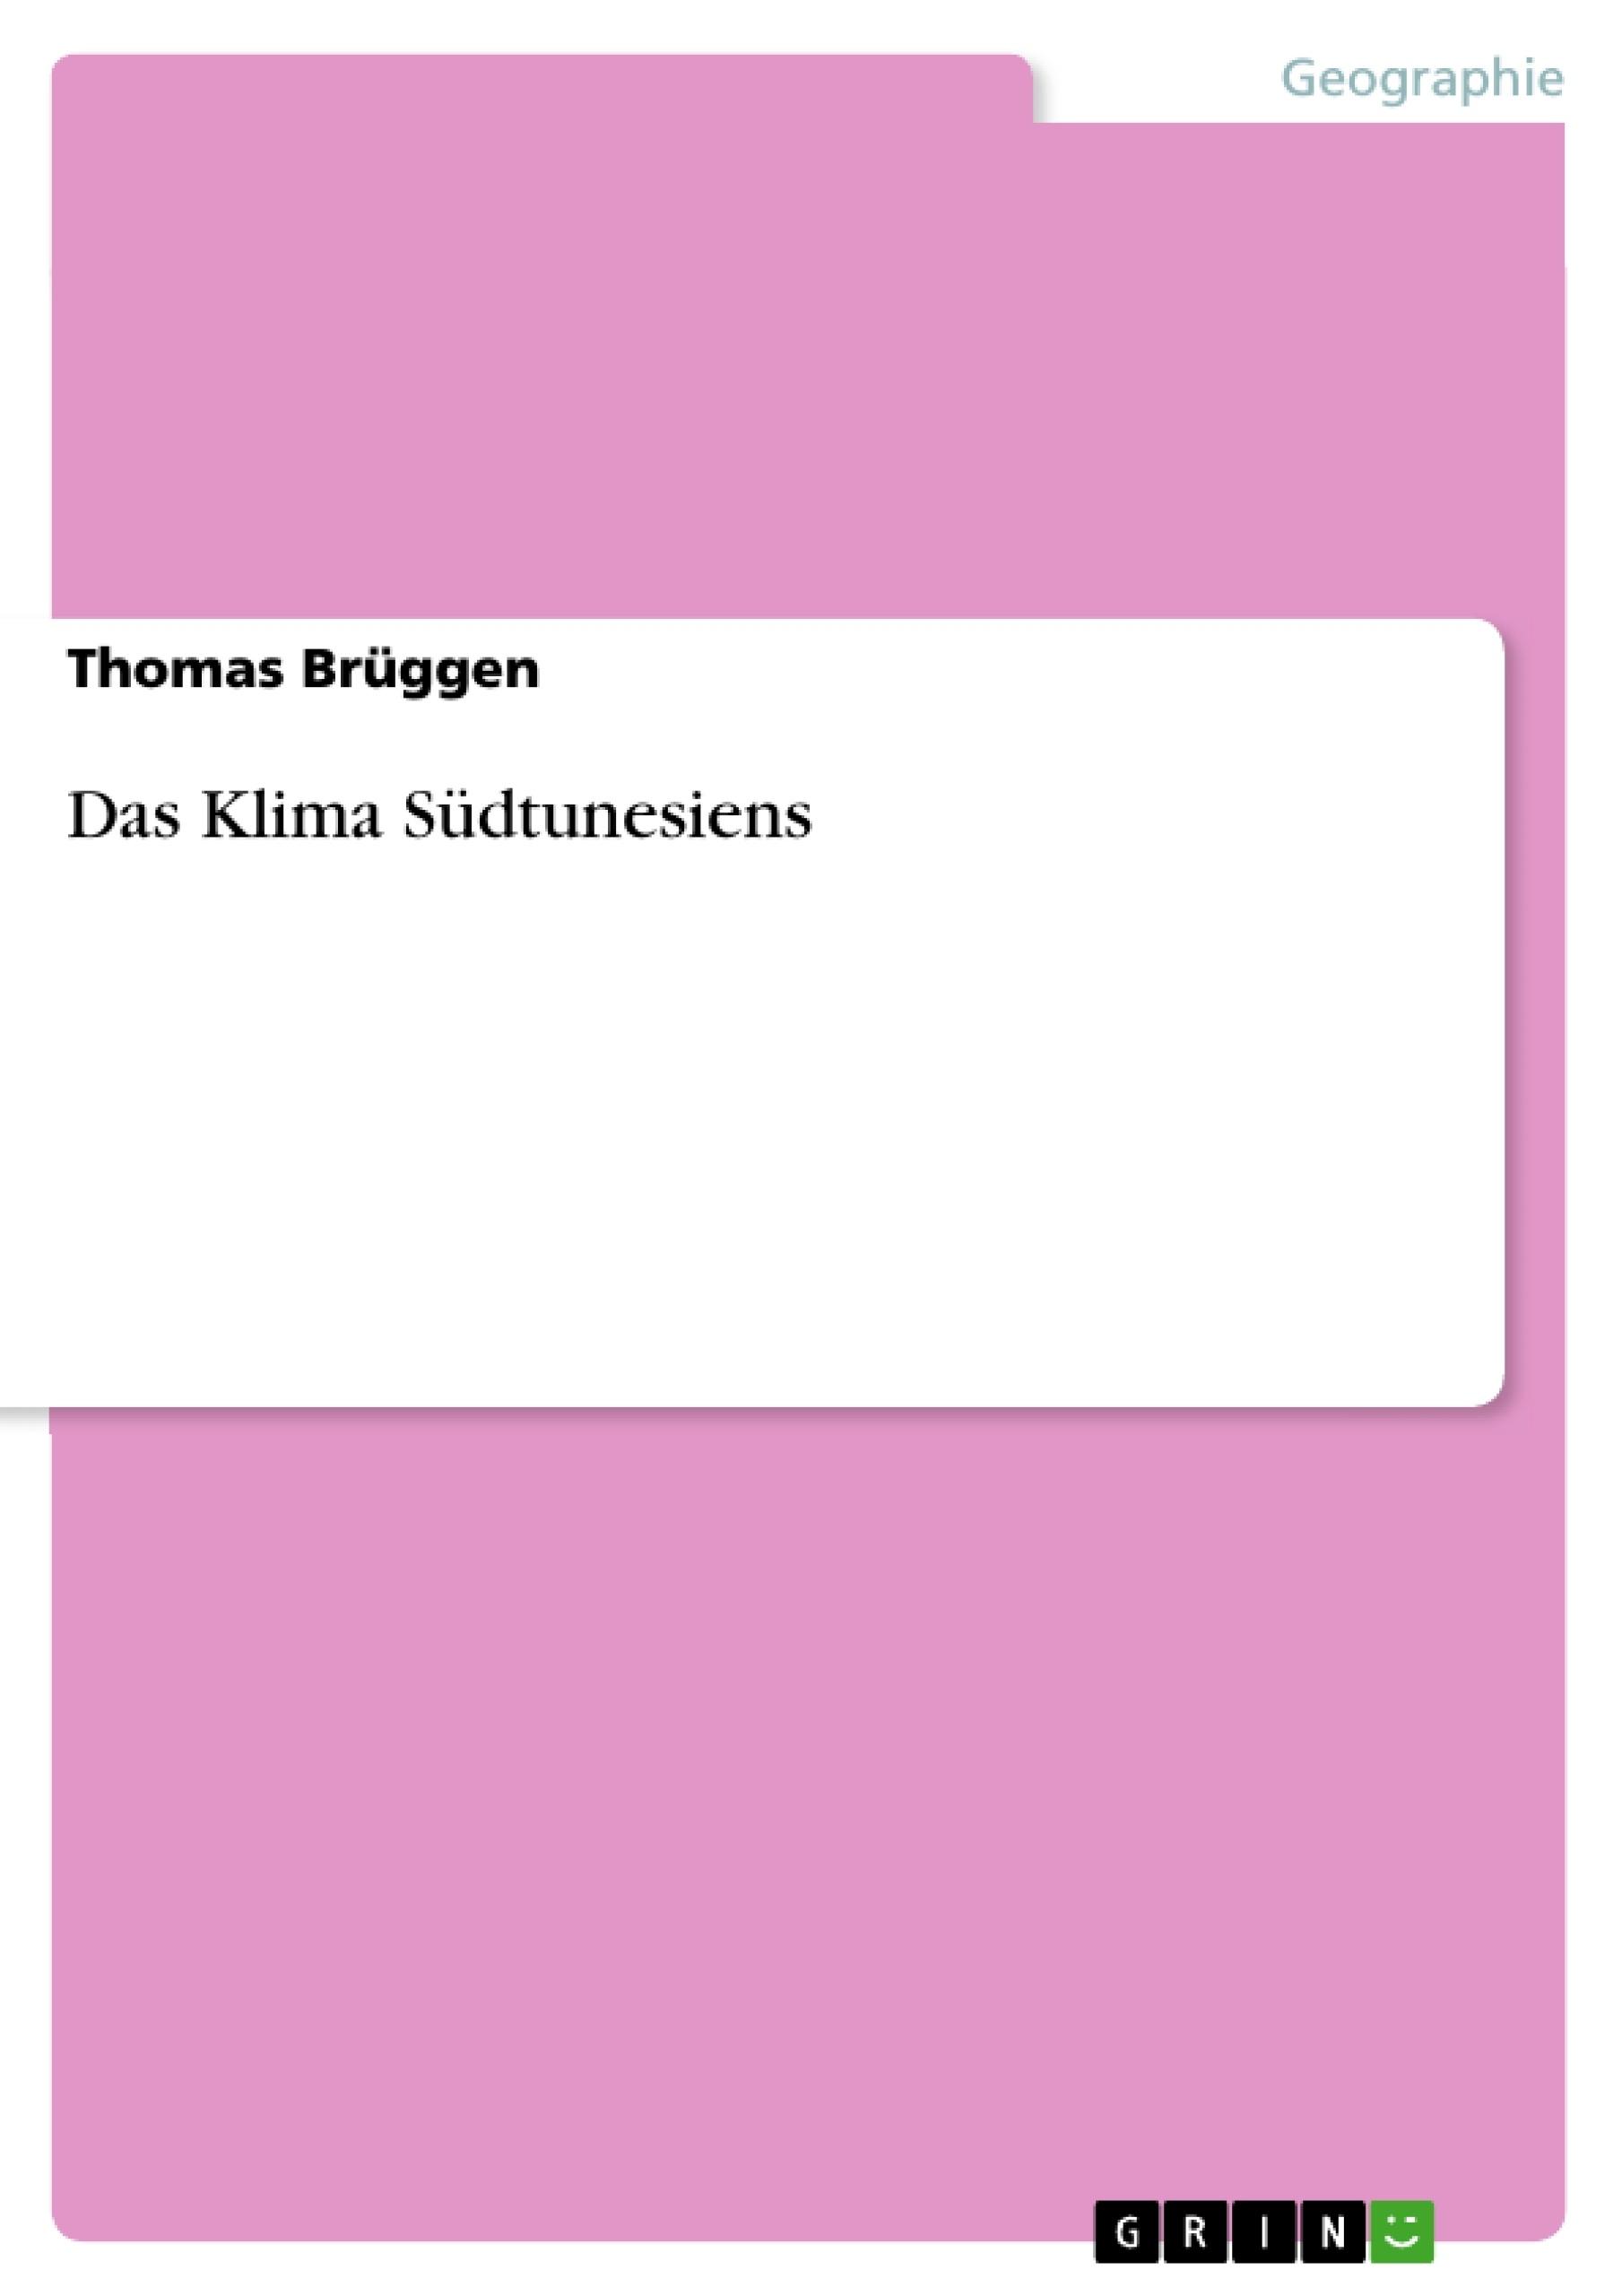 Titel: Das Klima Südtunesiens